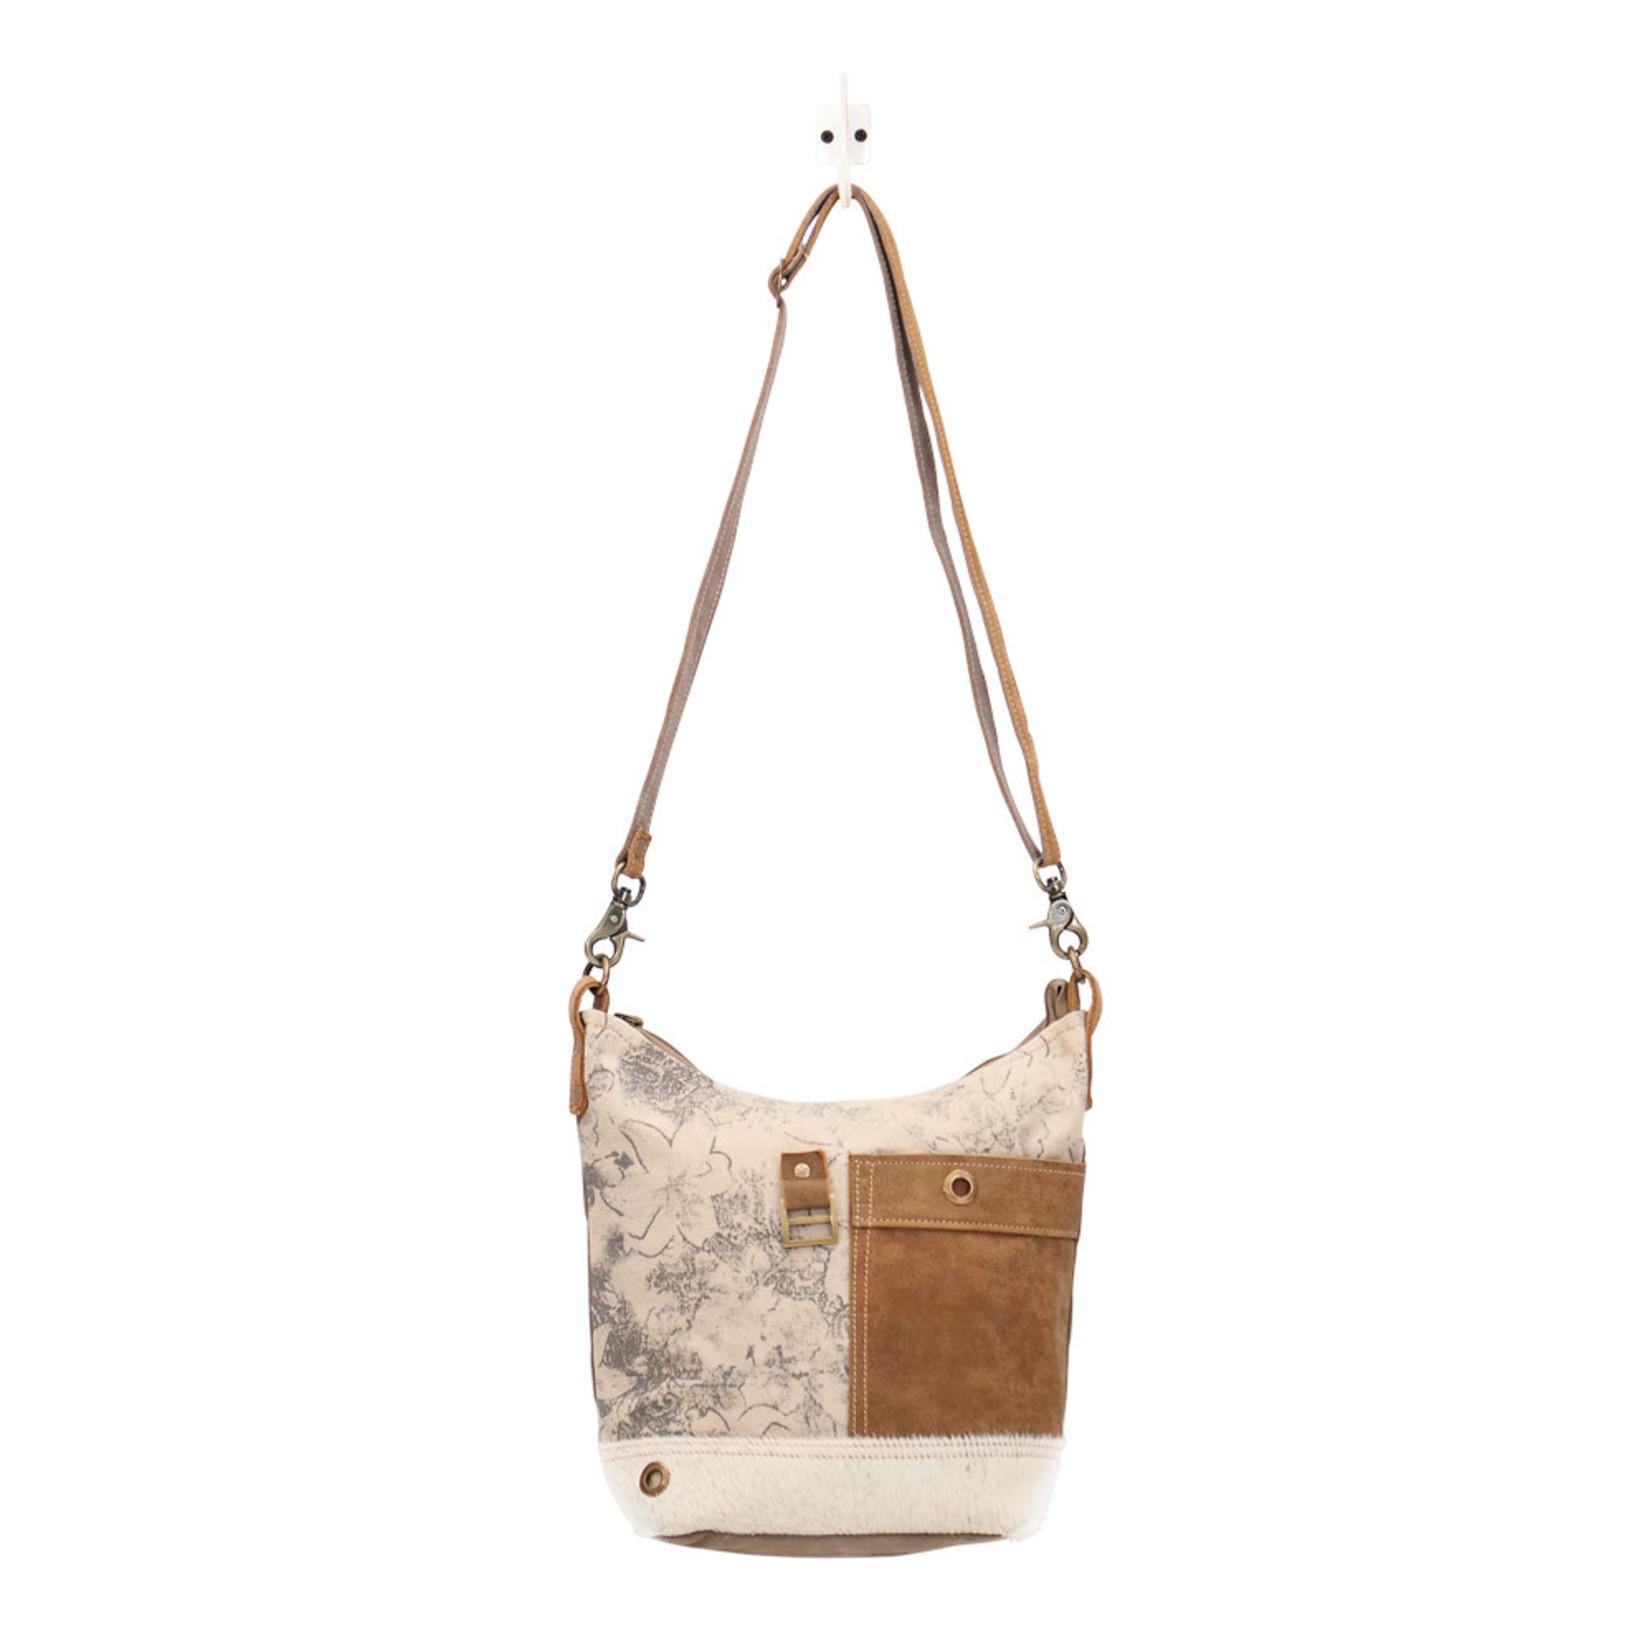 Myra Bags S-1480 Buttercup Shoulder Bag